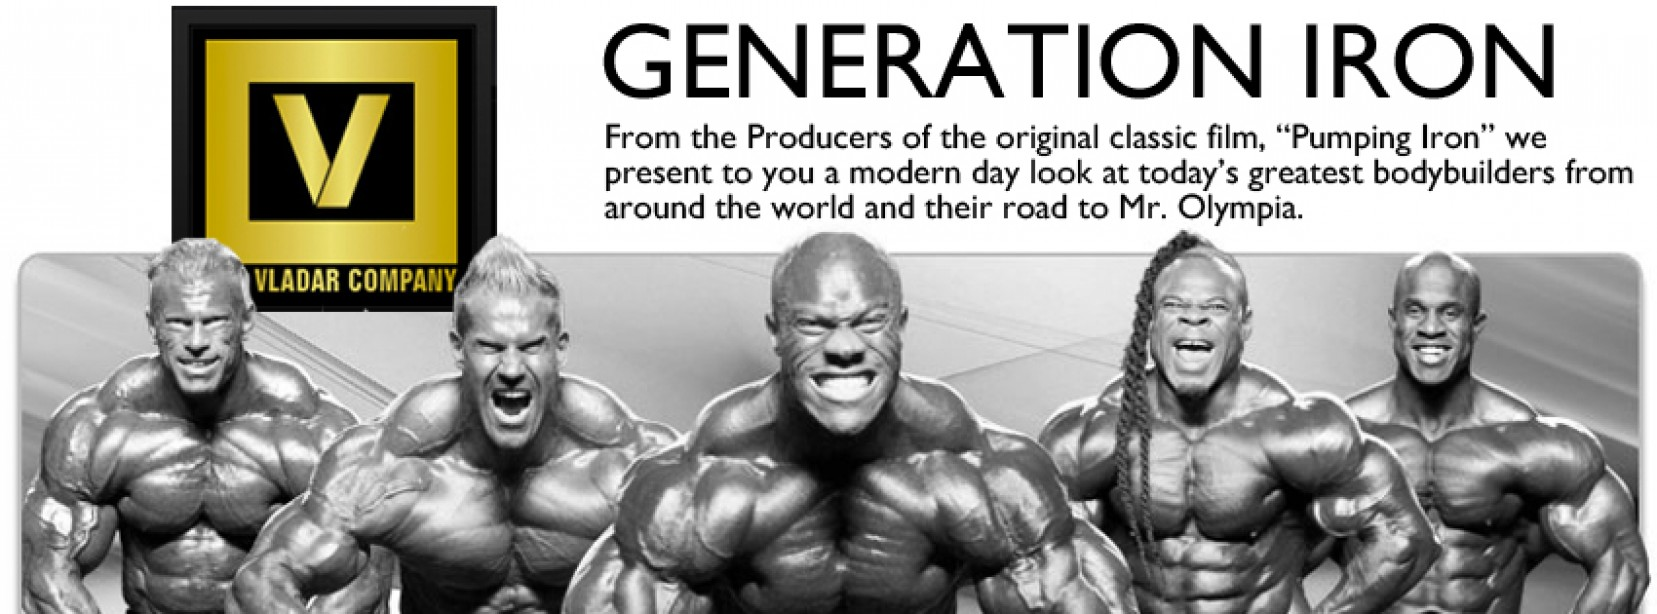 Generation Iron Movie Trailer